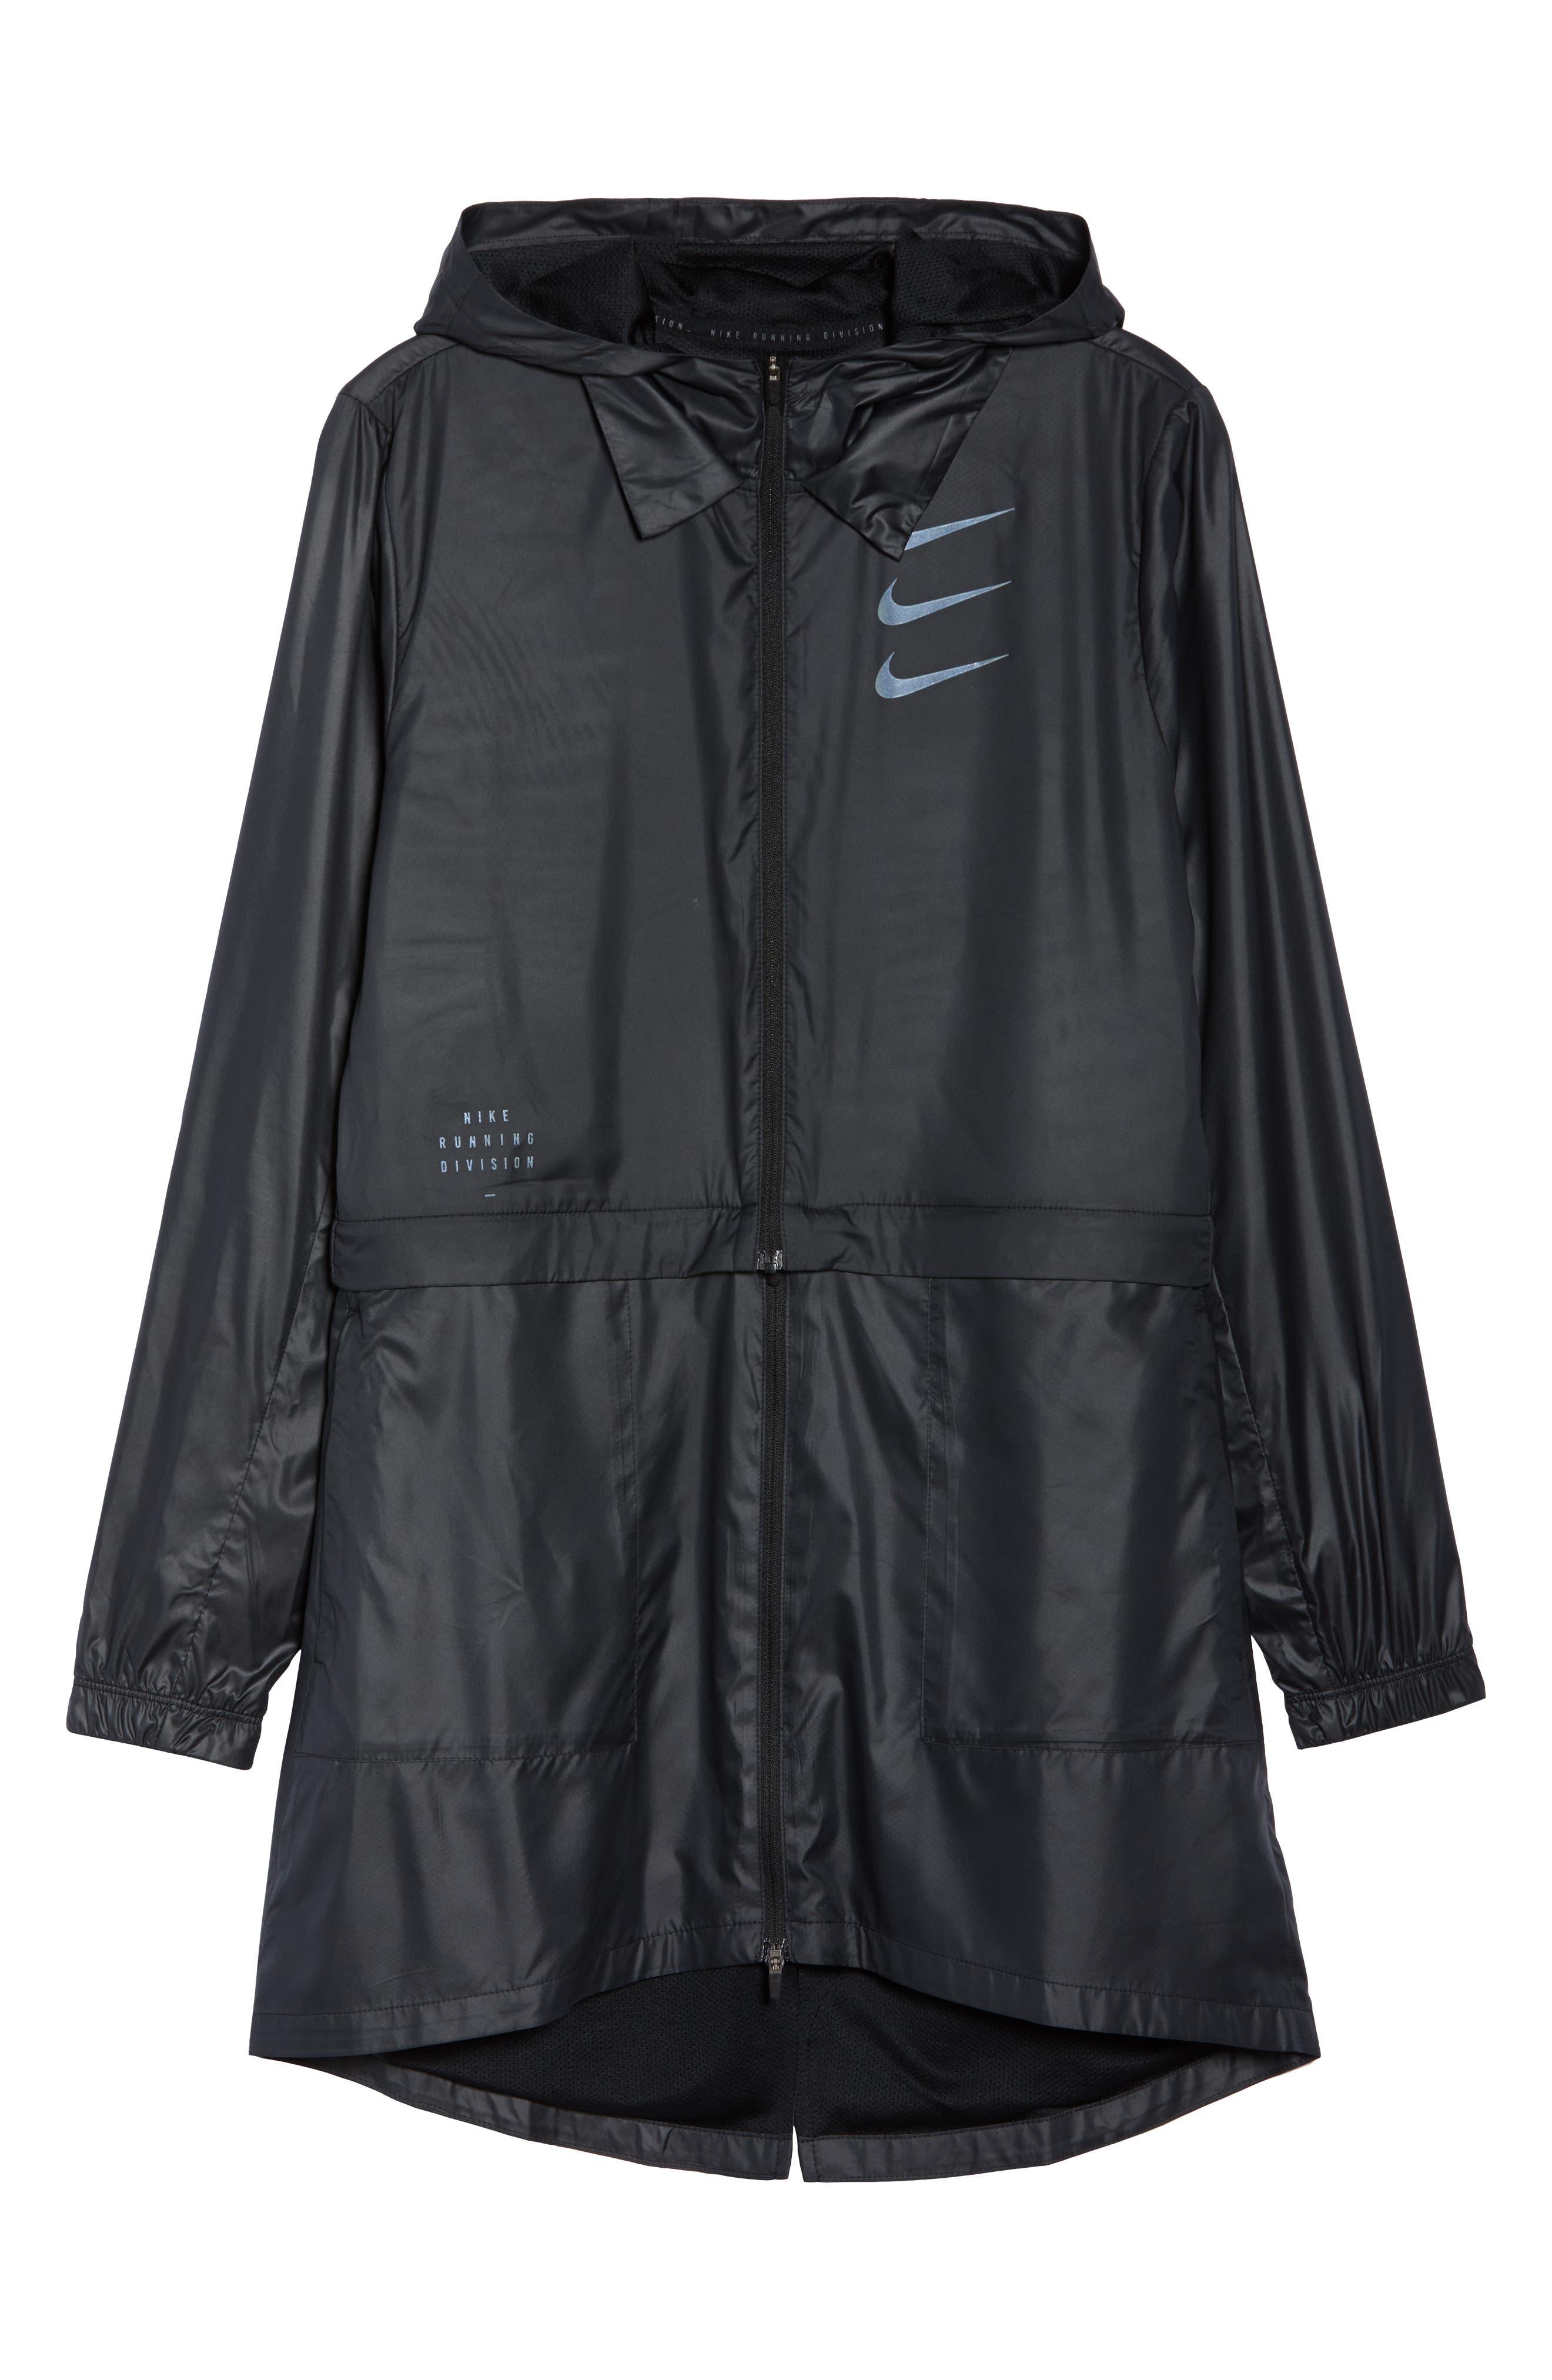 Women's Convertible Hooded Running Jacket,                             Alternate thumbnail 7, color,                             010